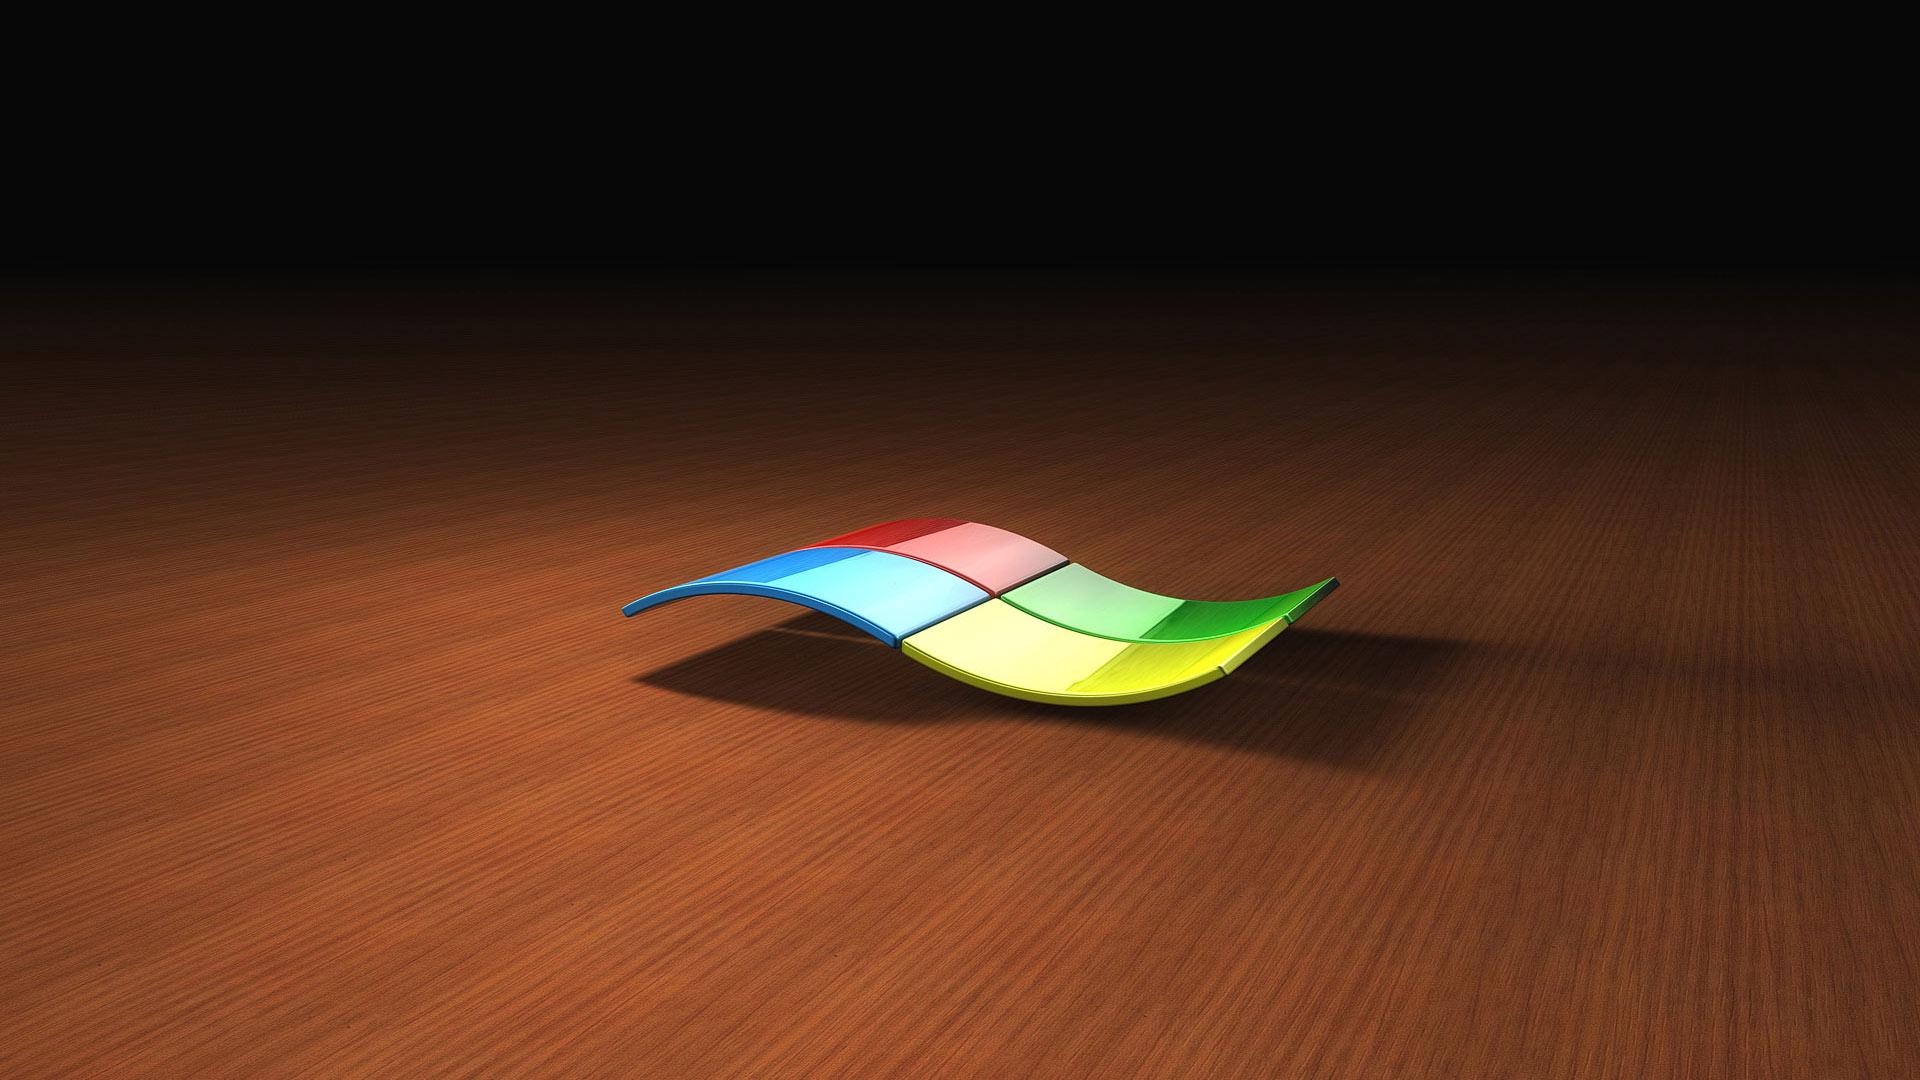 Windows 10 hd desktop wallpaper wallpapersafari - Hd wallpapers for pc windows ...